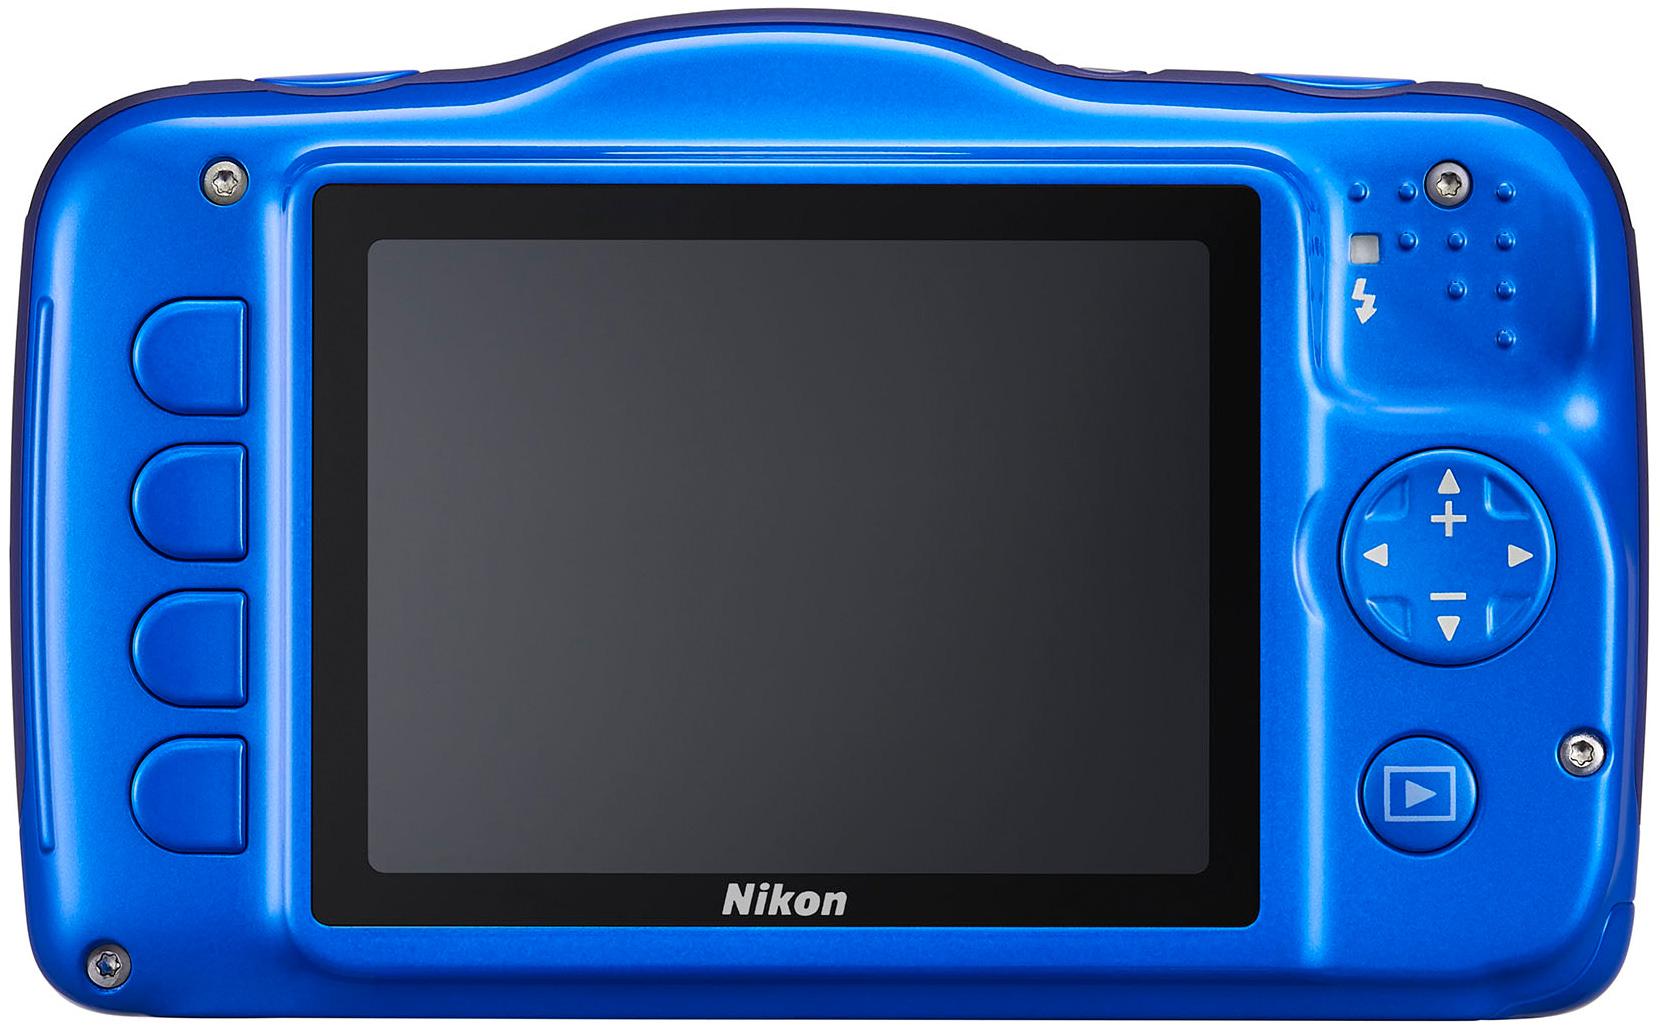 best bridge camera for image quality Ud5Bew2u